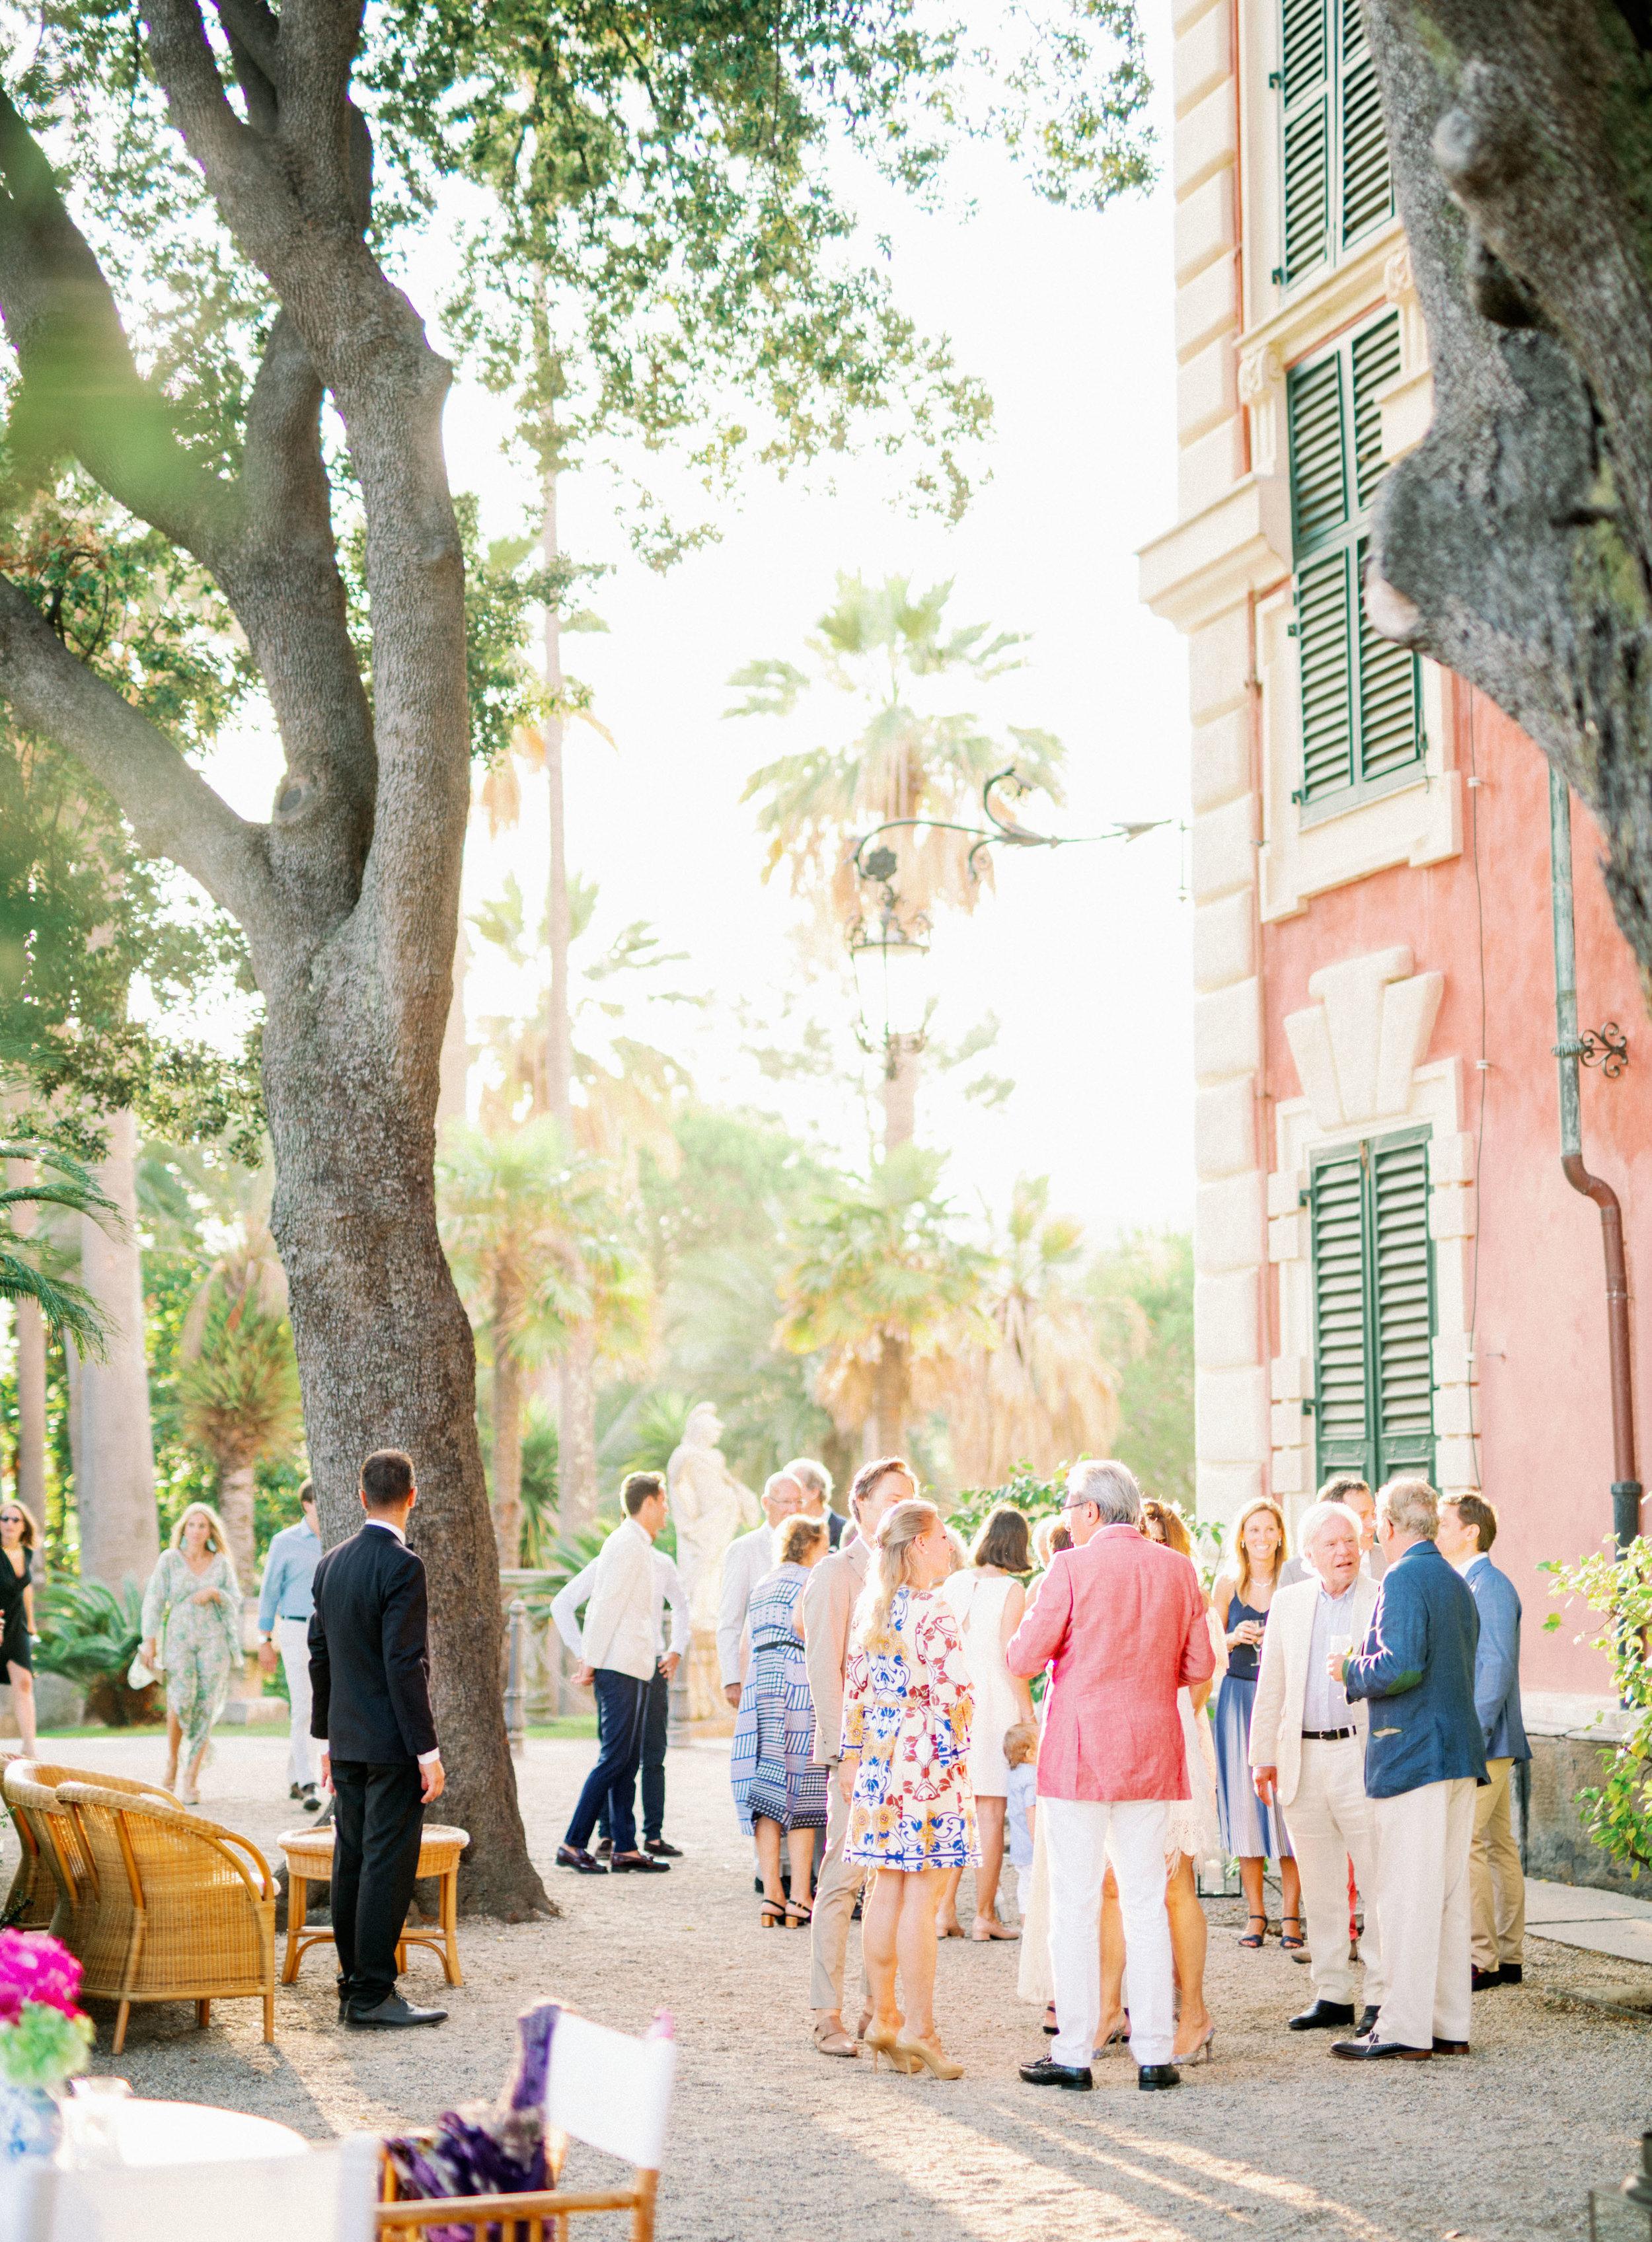 portofino-italy-destination-wedding-hunter-ryan-photo-4.jpg